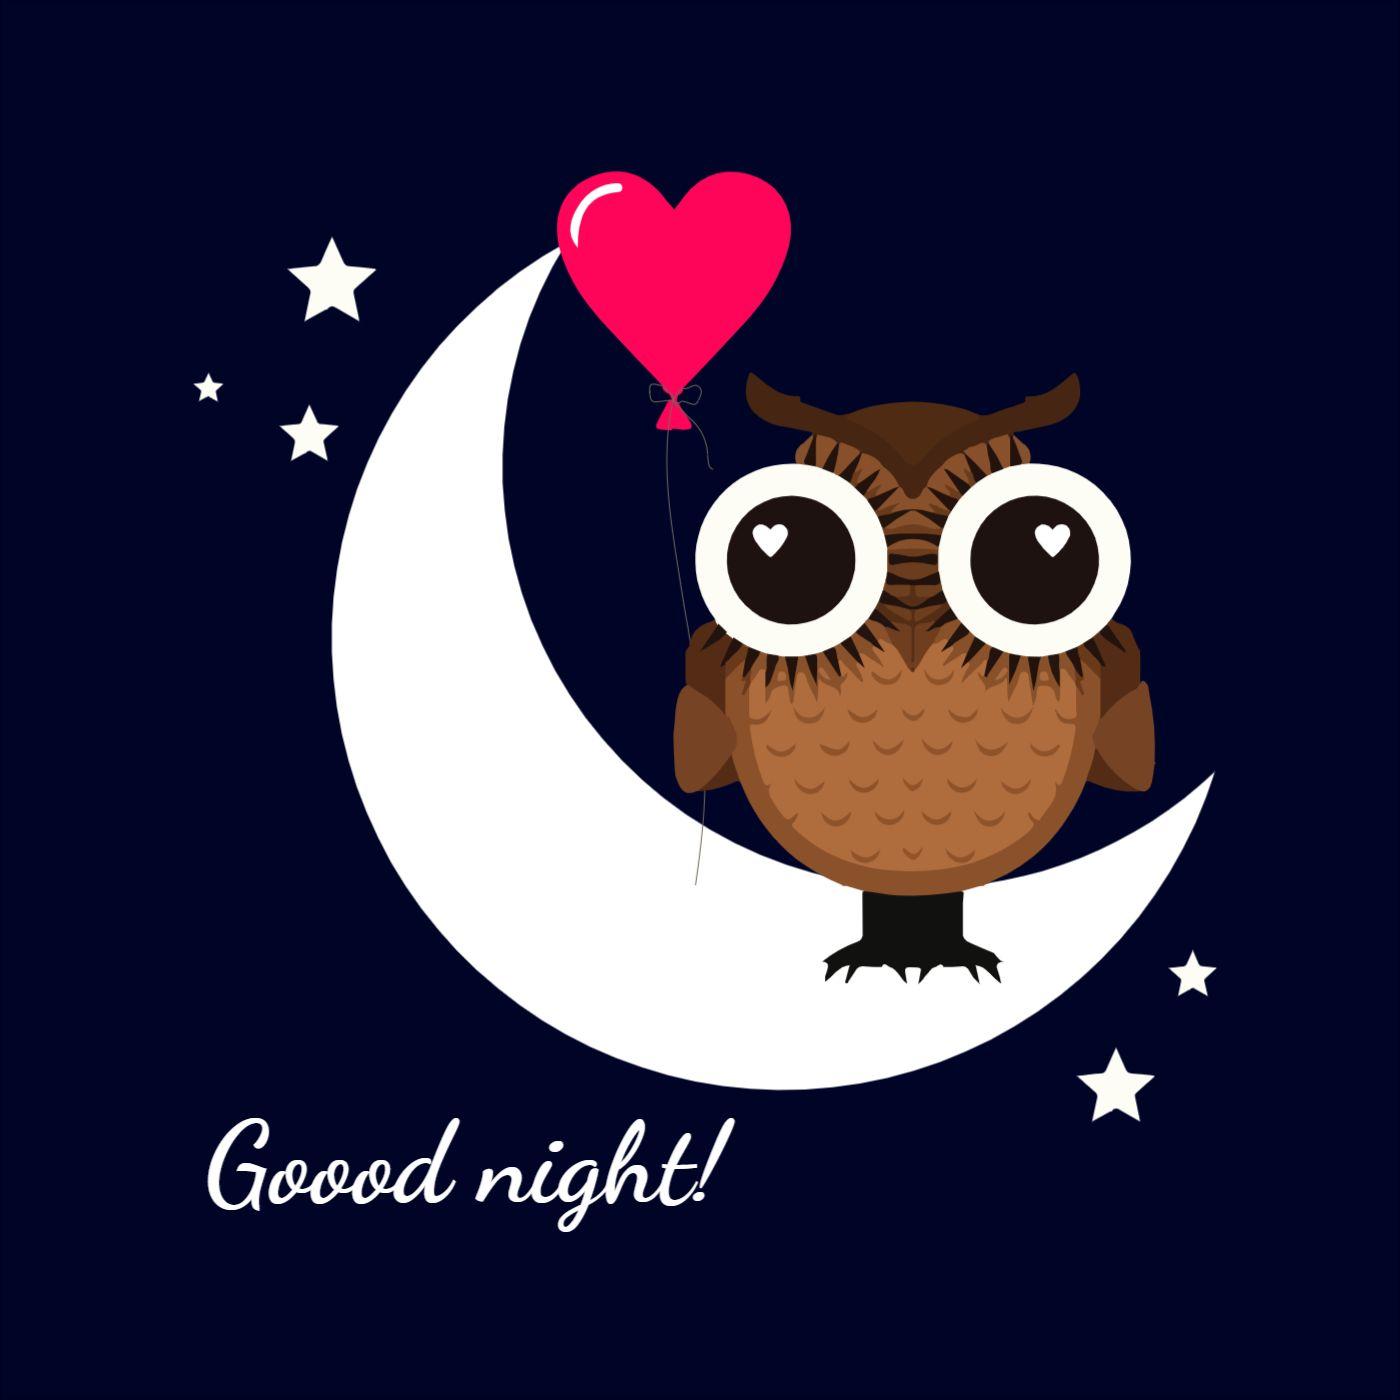 Pillow Owl Design Template